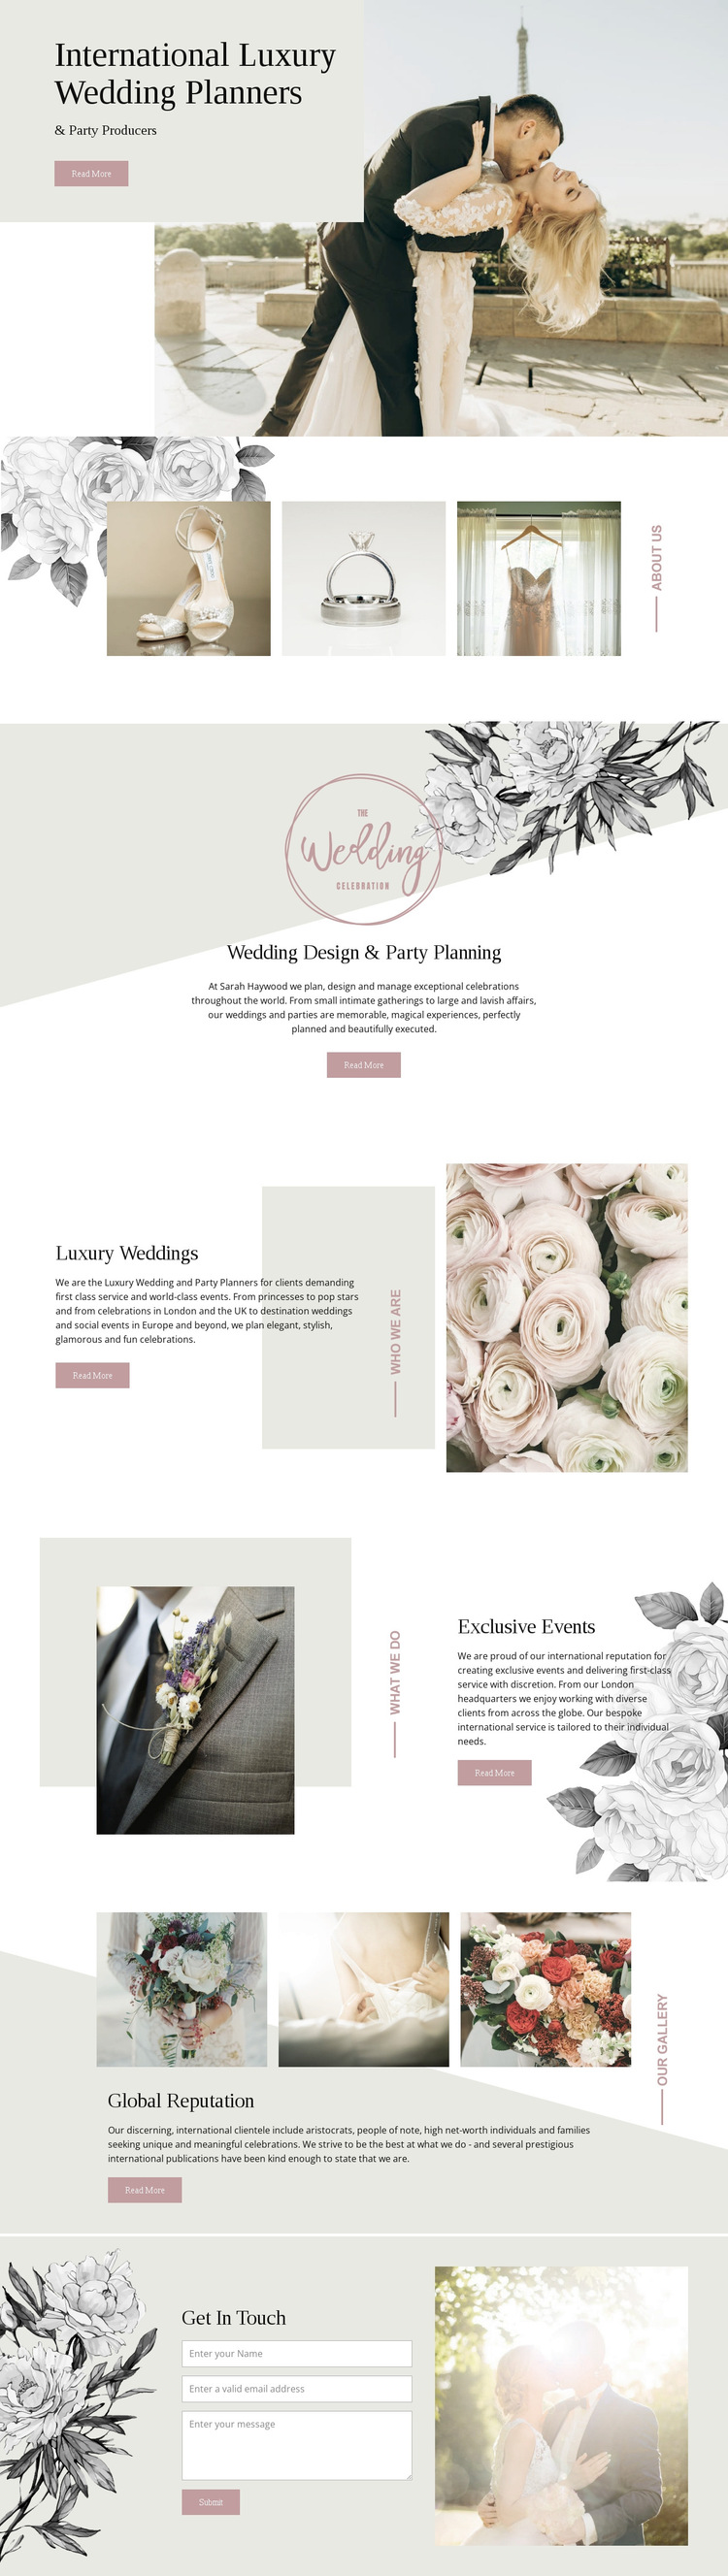 Planners of luxury wedding HTML5 Template